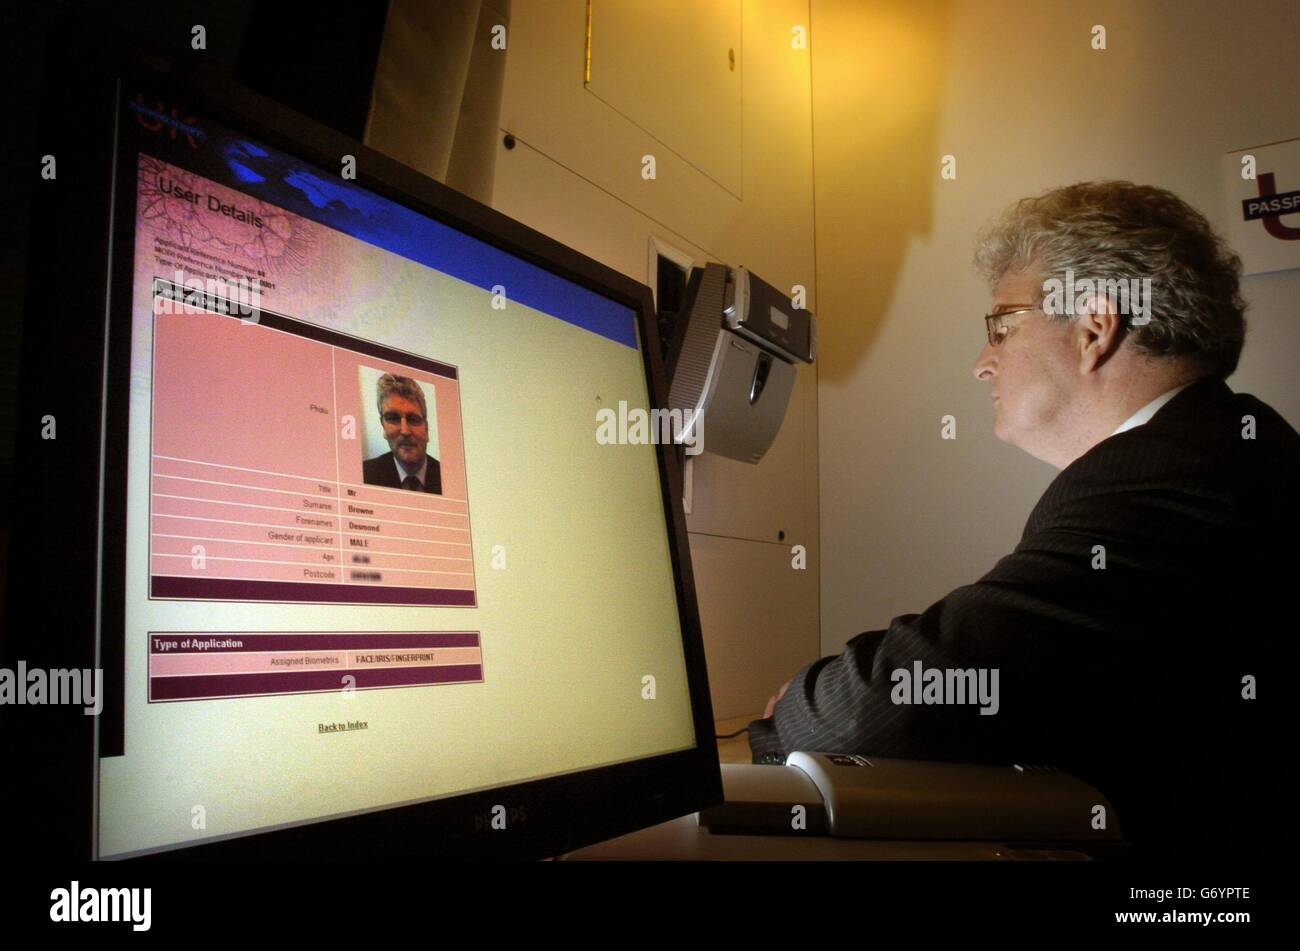 Biometric ID Cards - Stock Image